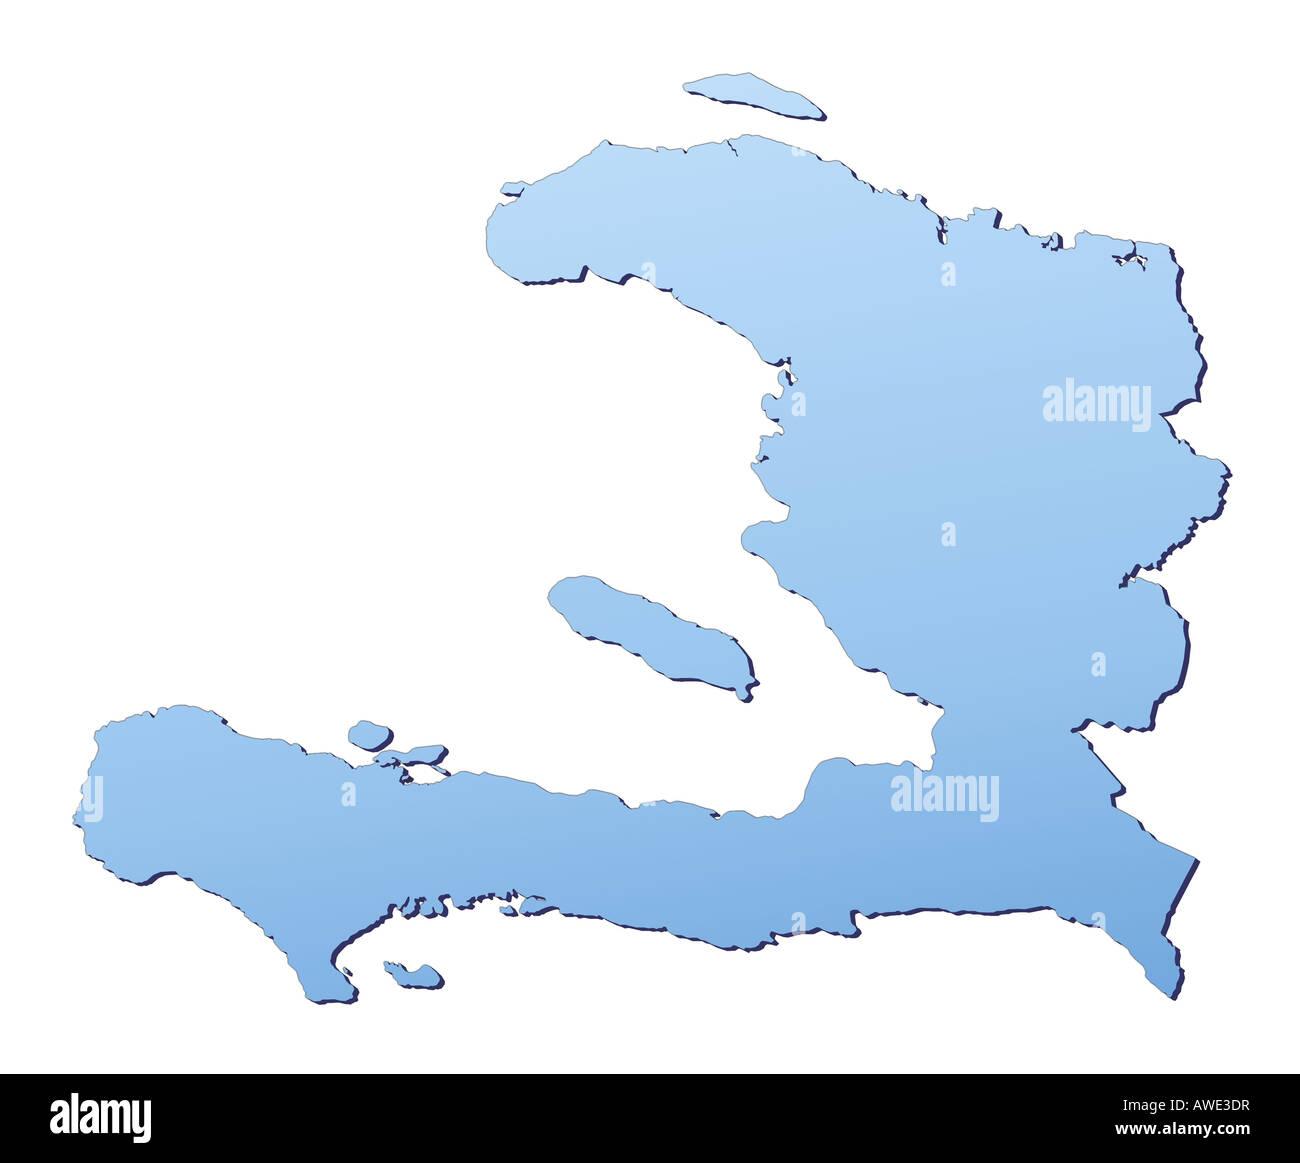 Haiti map stock photos haiti map stock images alamy haiti map stock image gumiabroncs Images